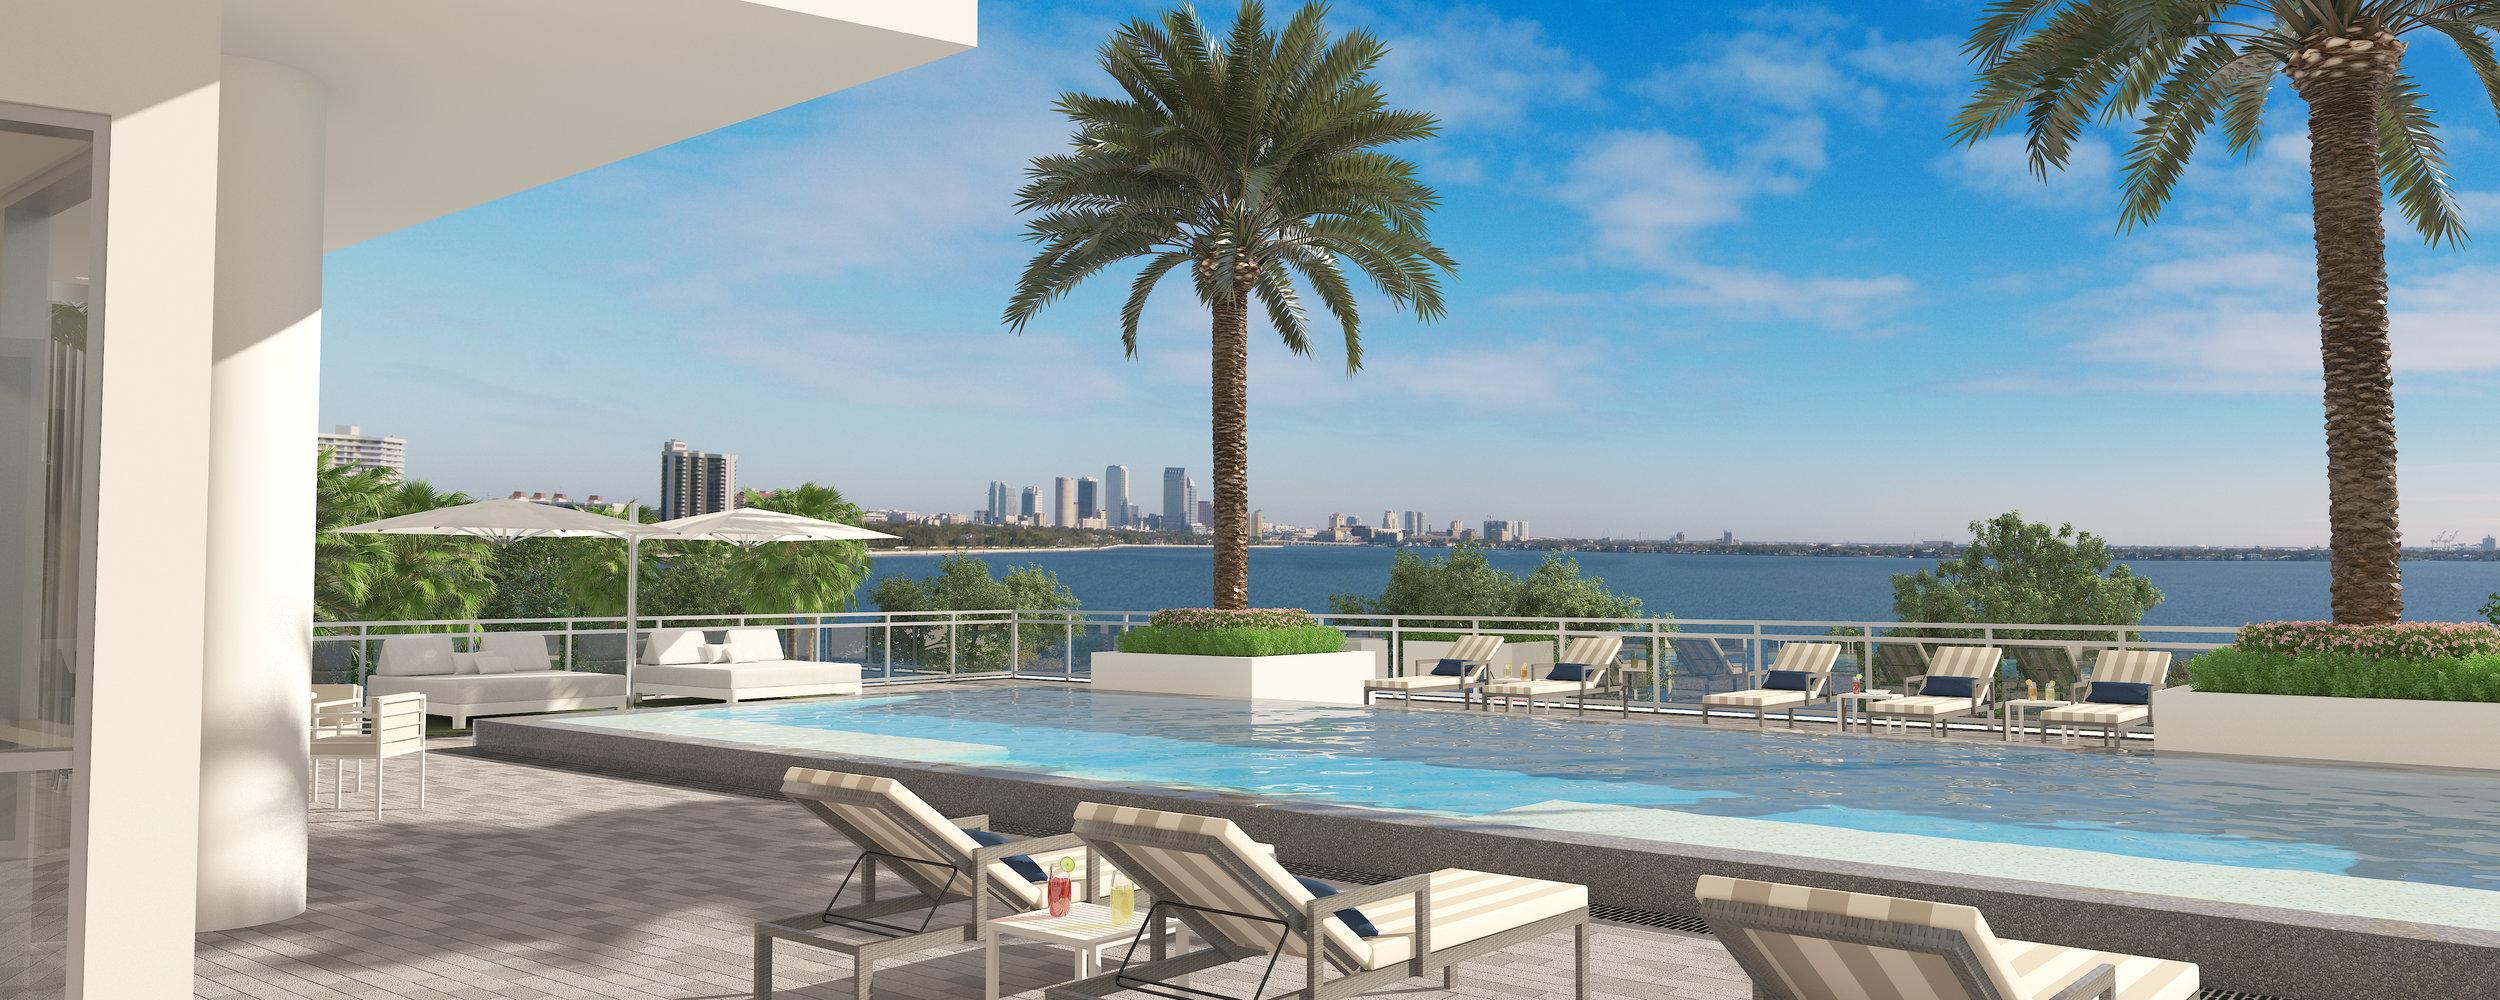 Pool overlooks prestigious Bayshore.jpg